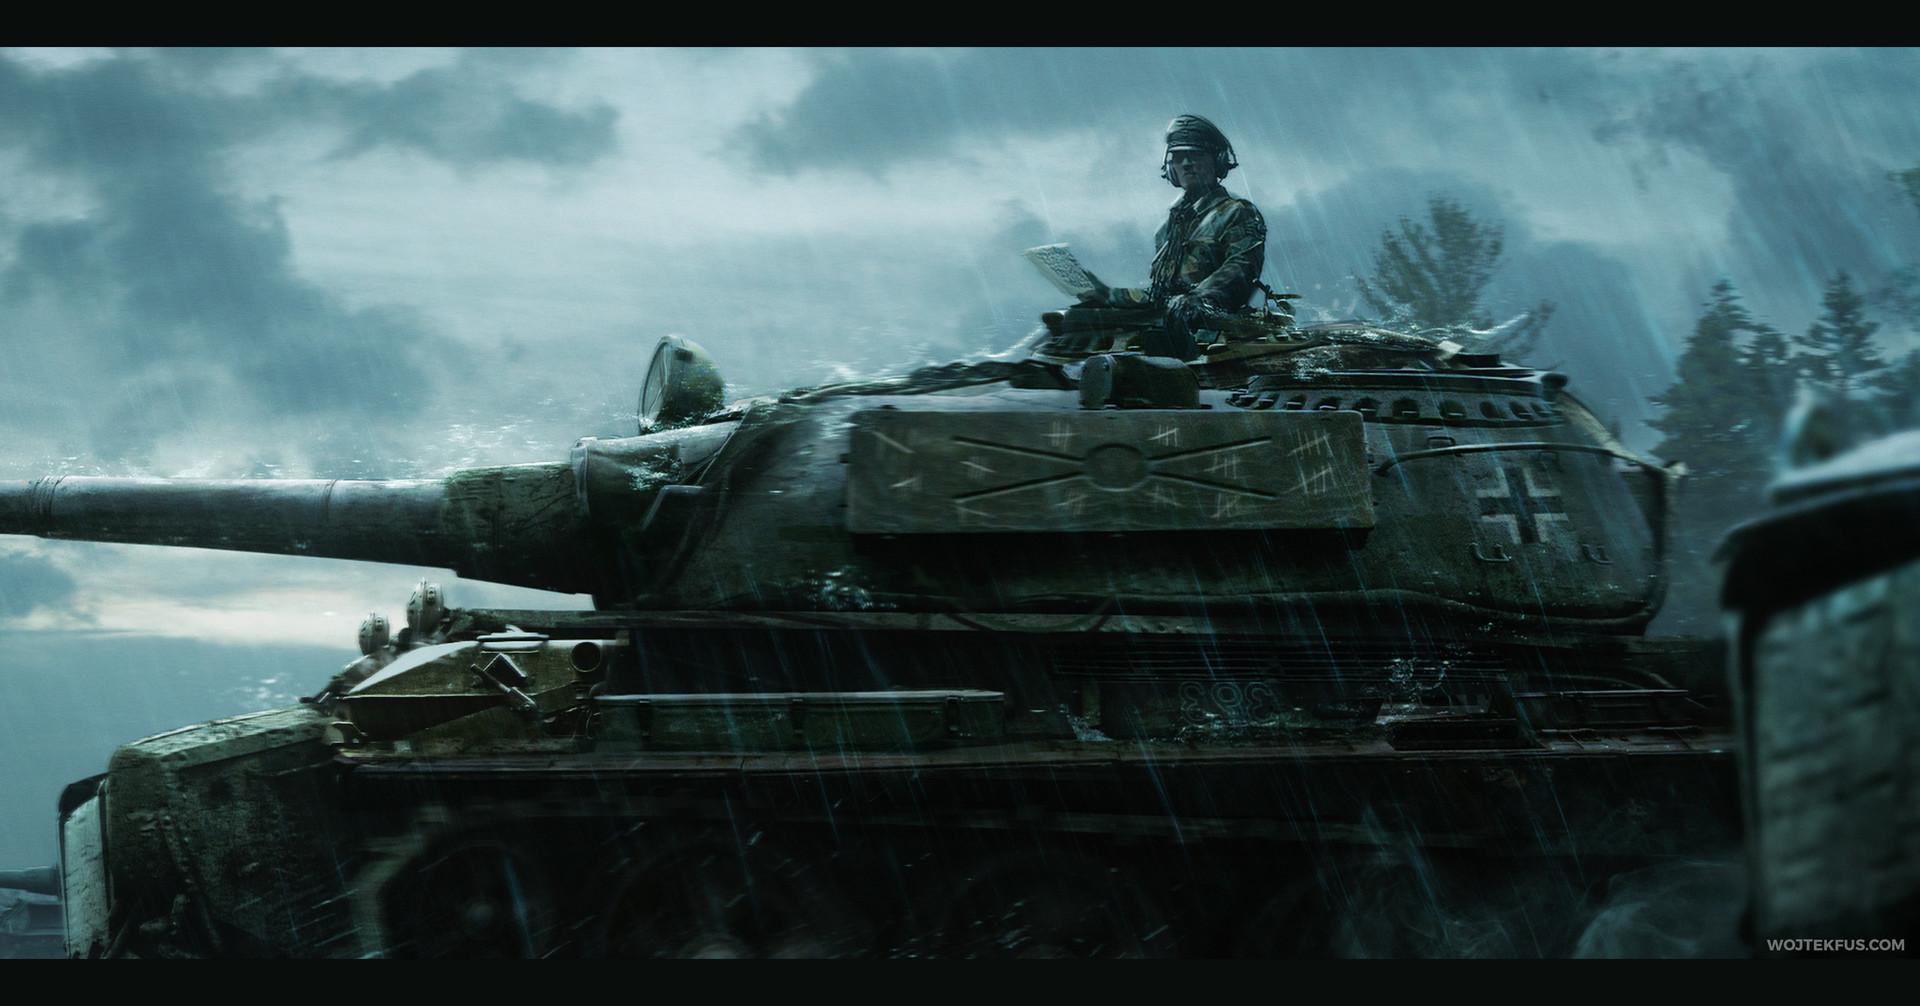 Wojtek fus tank1zoom